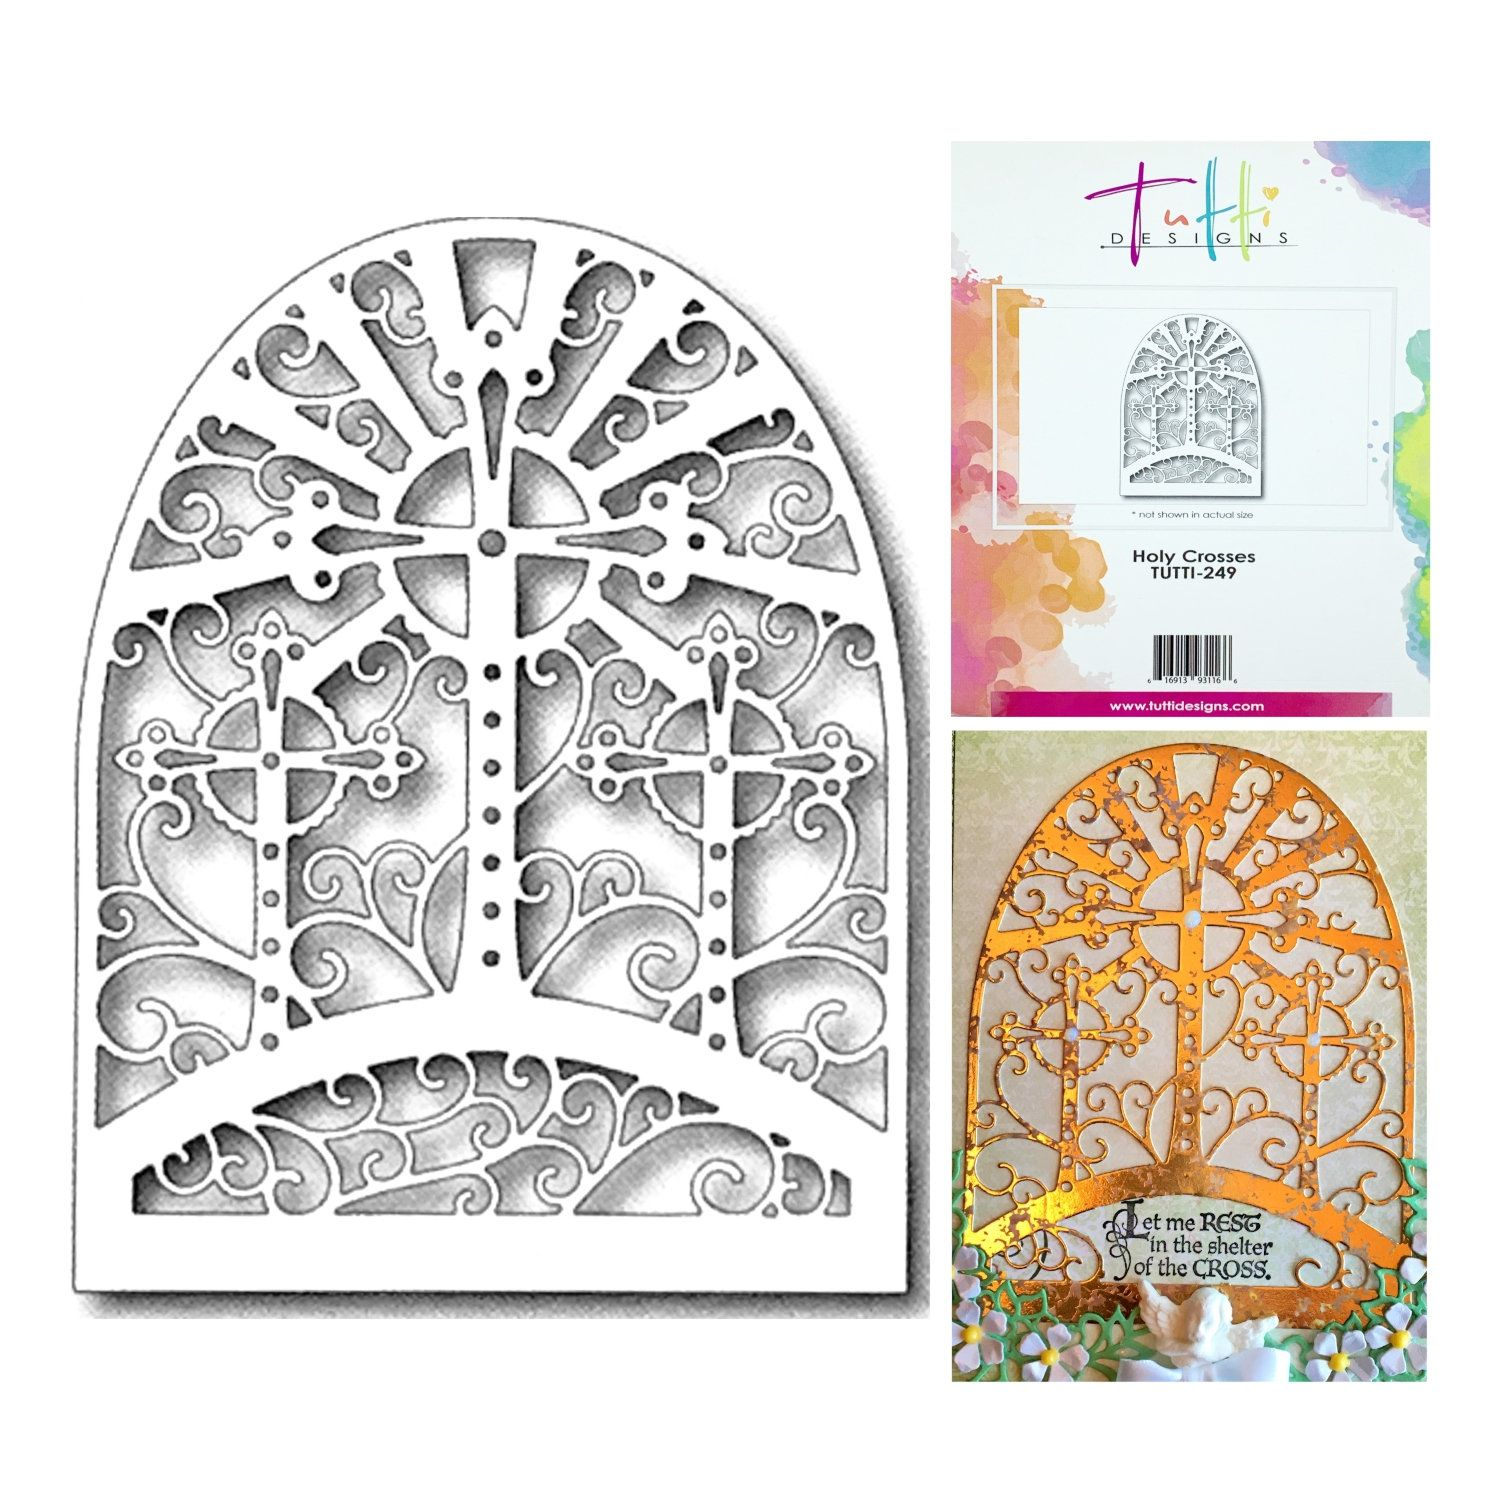 Easter Cross Vine Cutting Dies Scrapbooking Embossing Card Album Frame Stencils